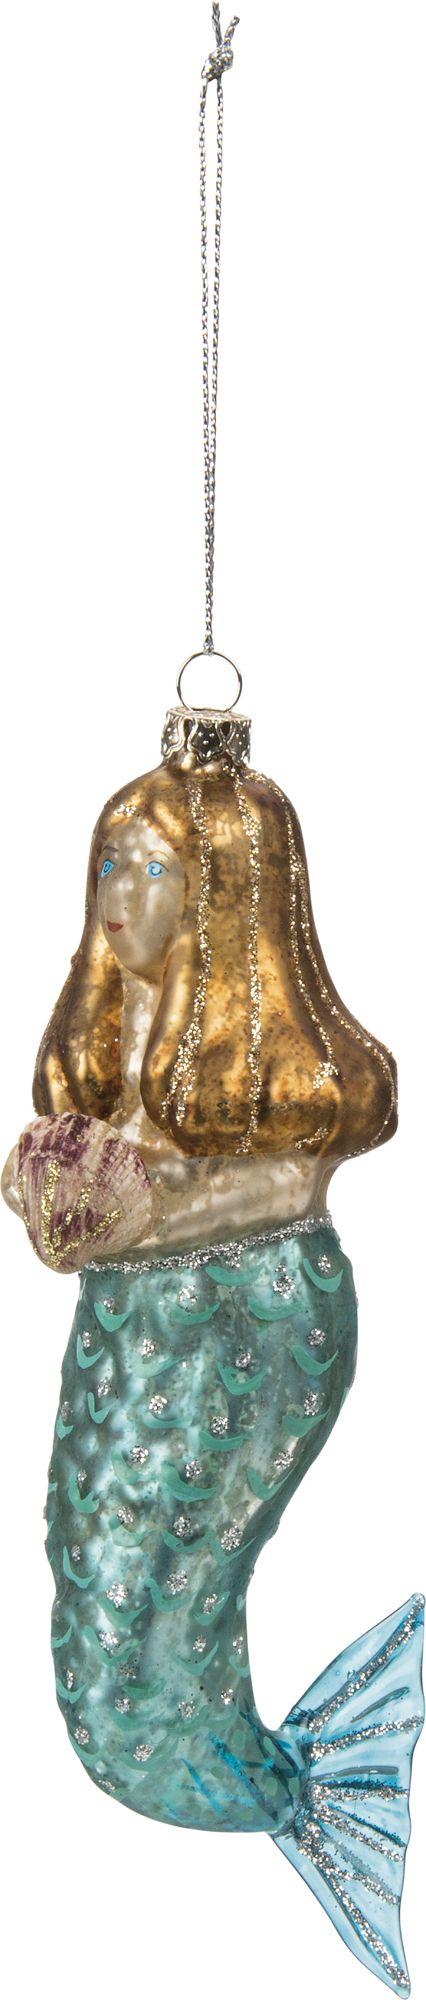 Glass-mermaid-ornament At Seasideinspired.com Beach Ocean Home Decor